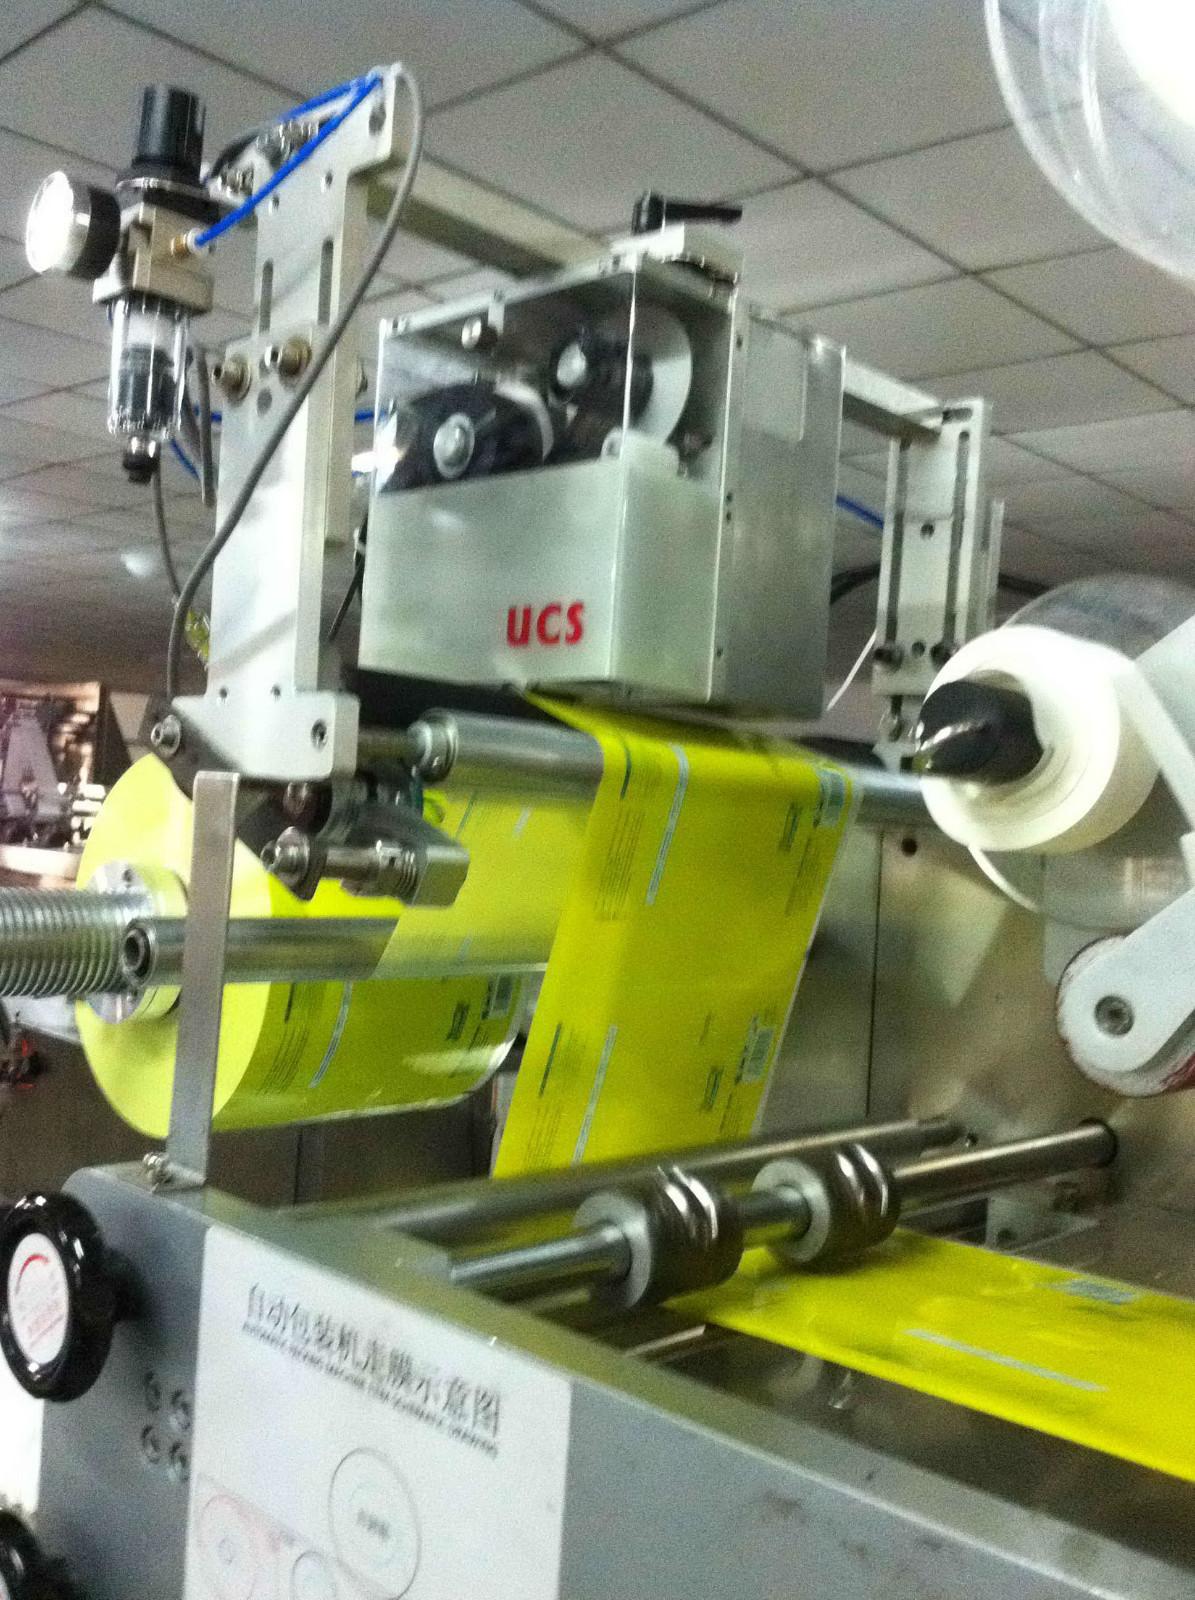 UCS6連續式熱轉印打碼機